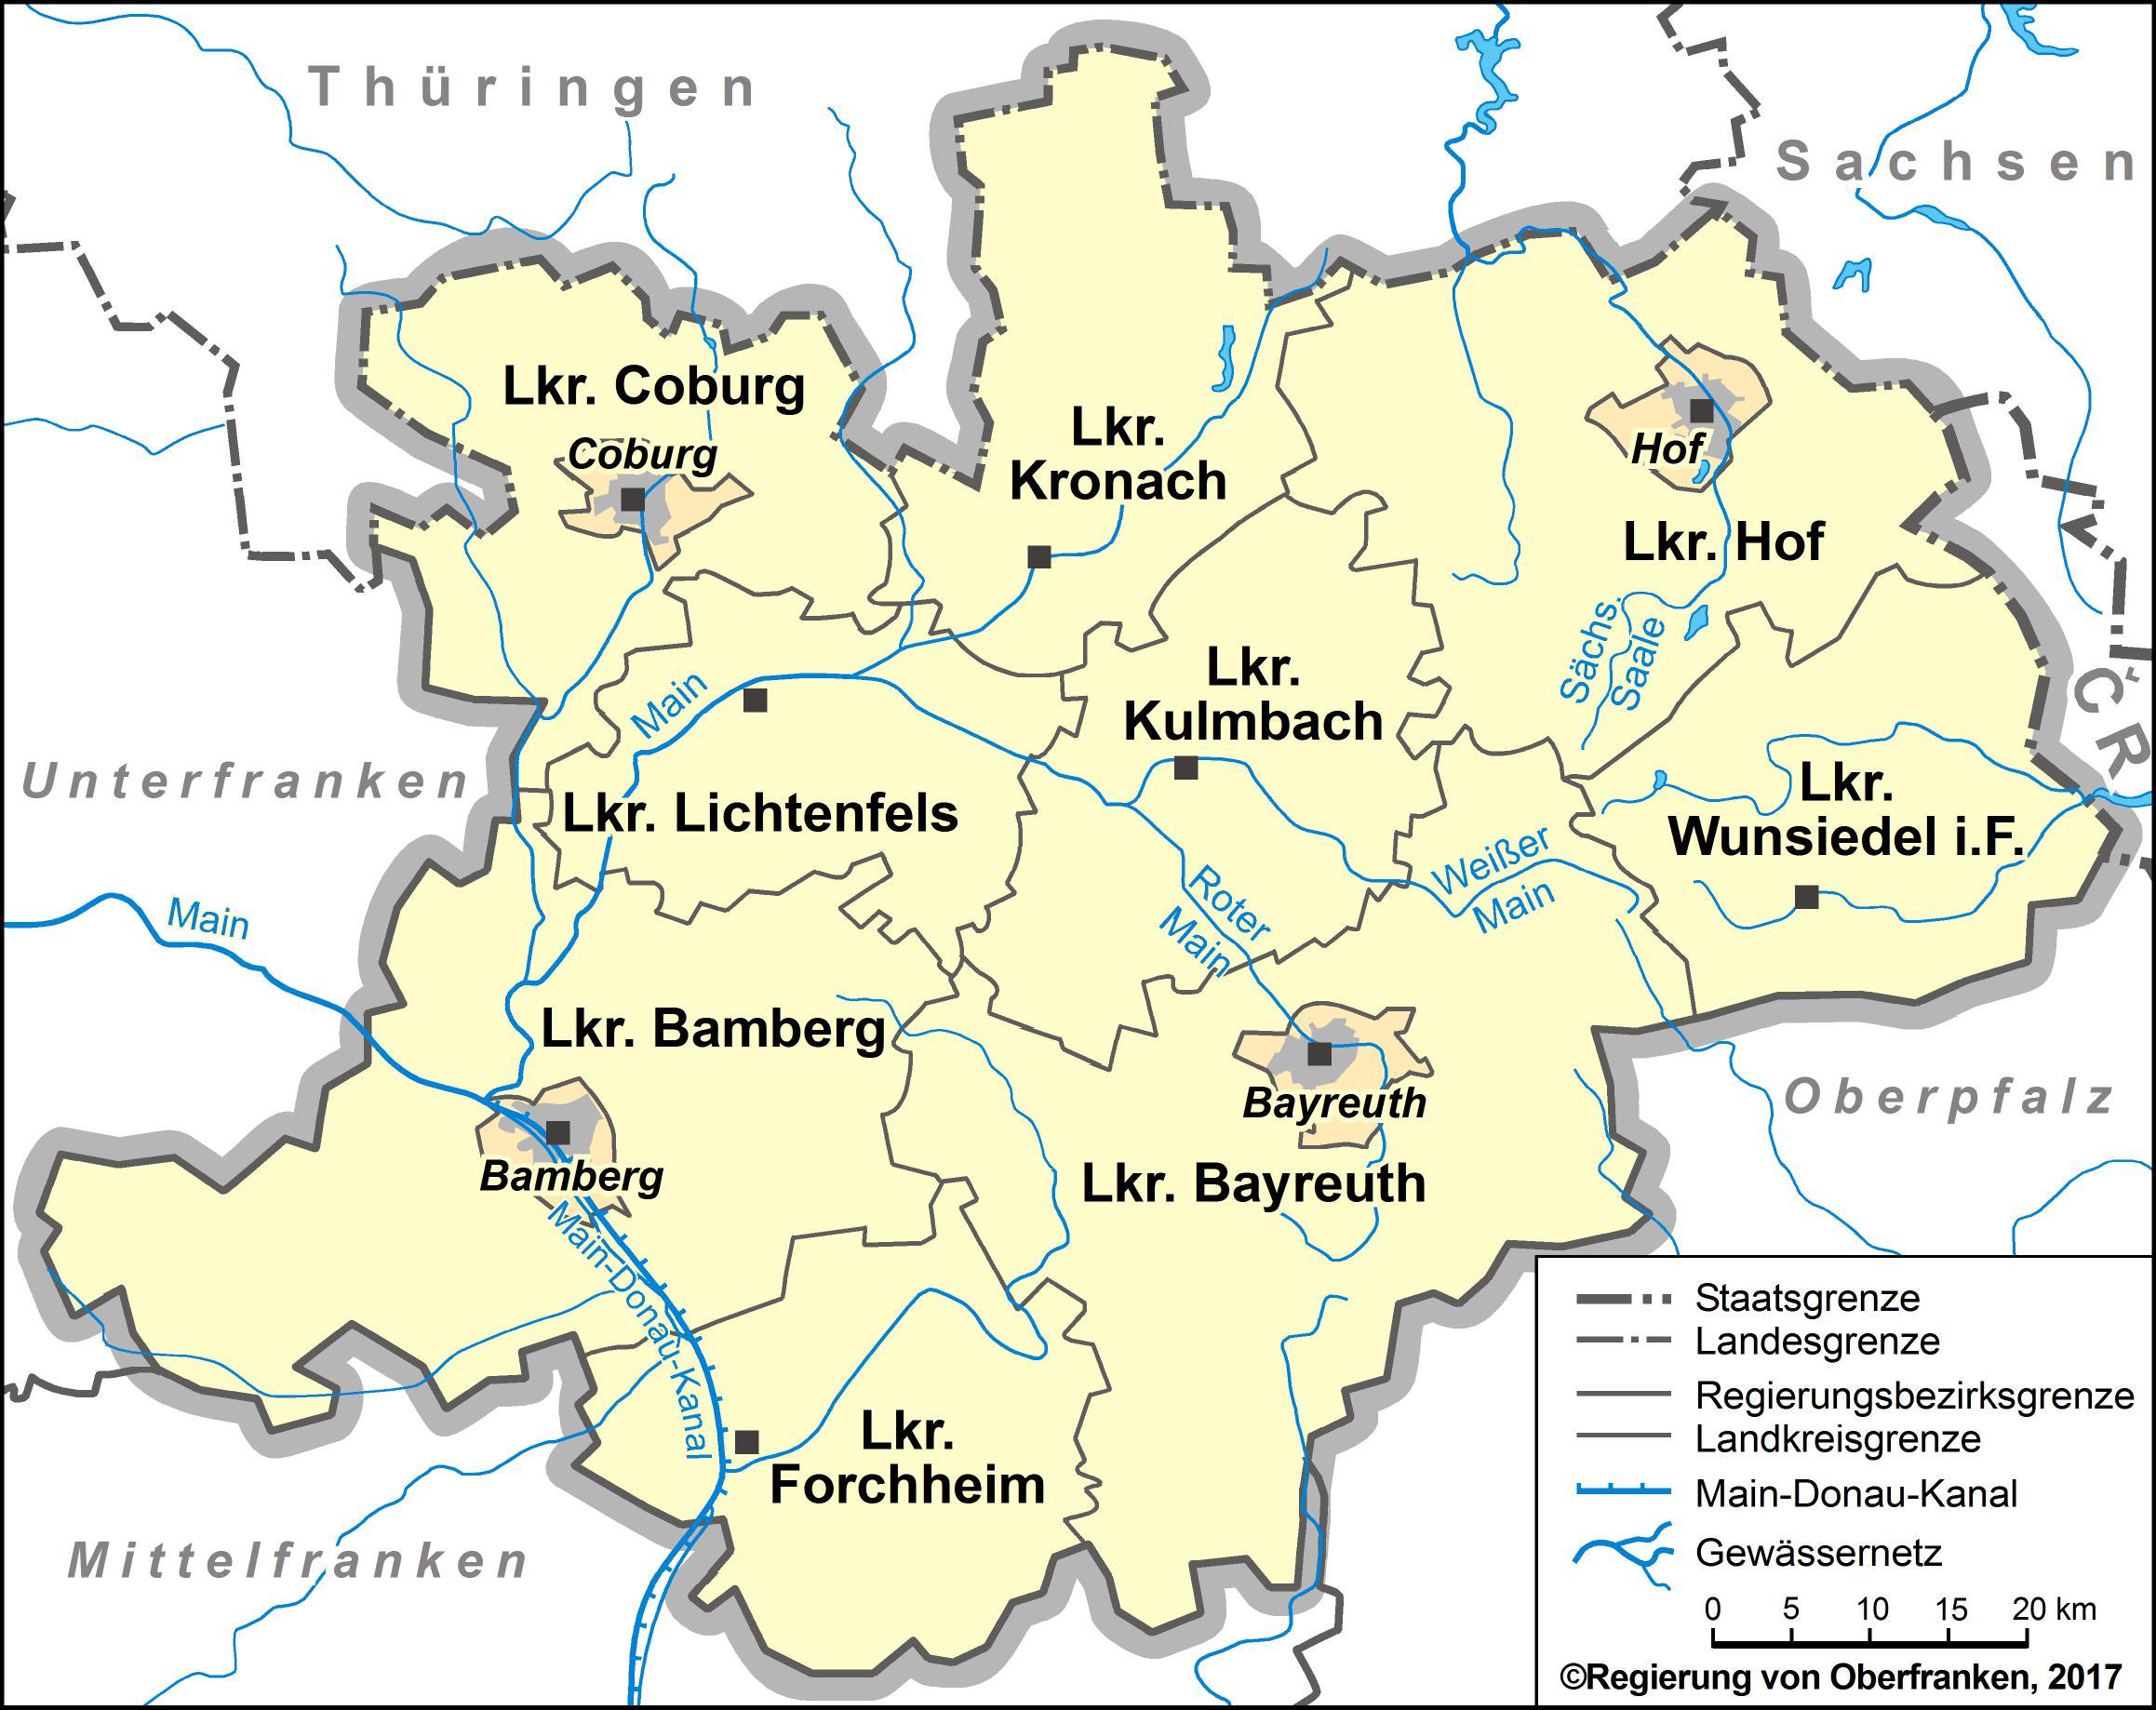 Oberfranken Karte.Stiftung Oberfrankenstiftung